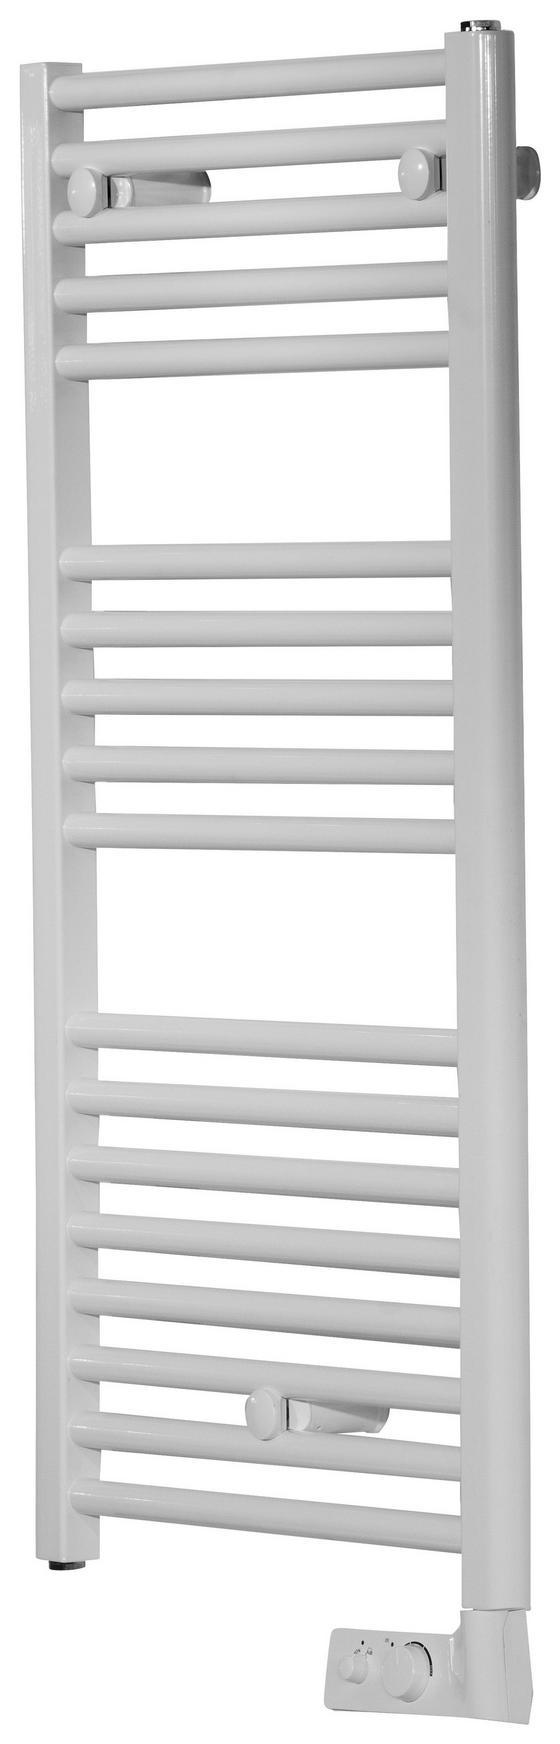 Badheizkörper Innsbruck I350 - Weiß, Metall (48/92/3cm)